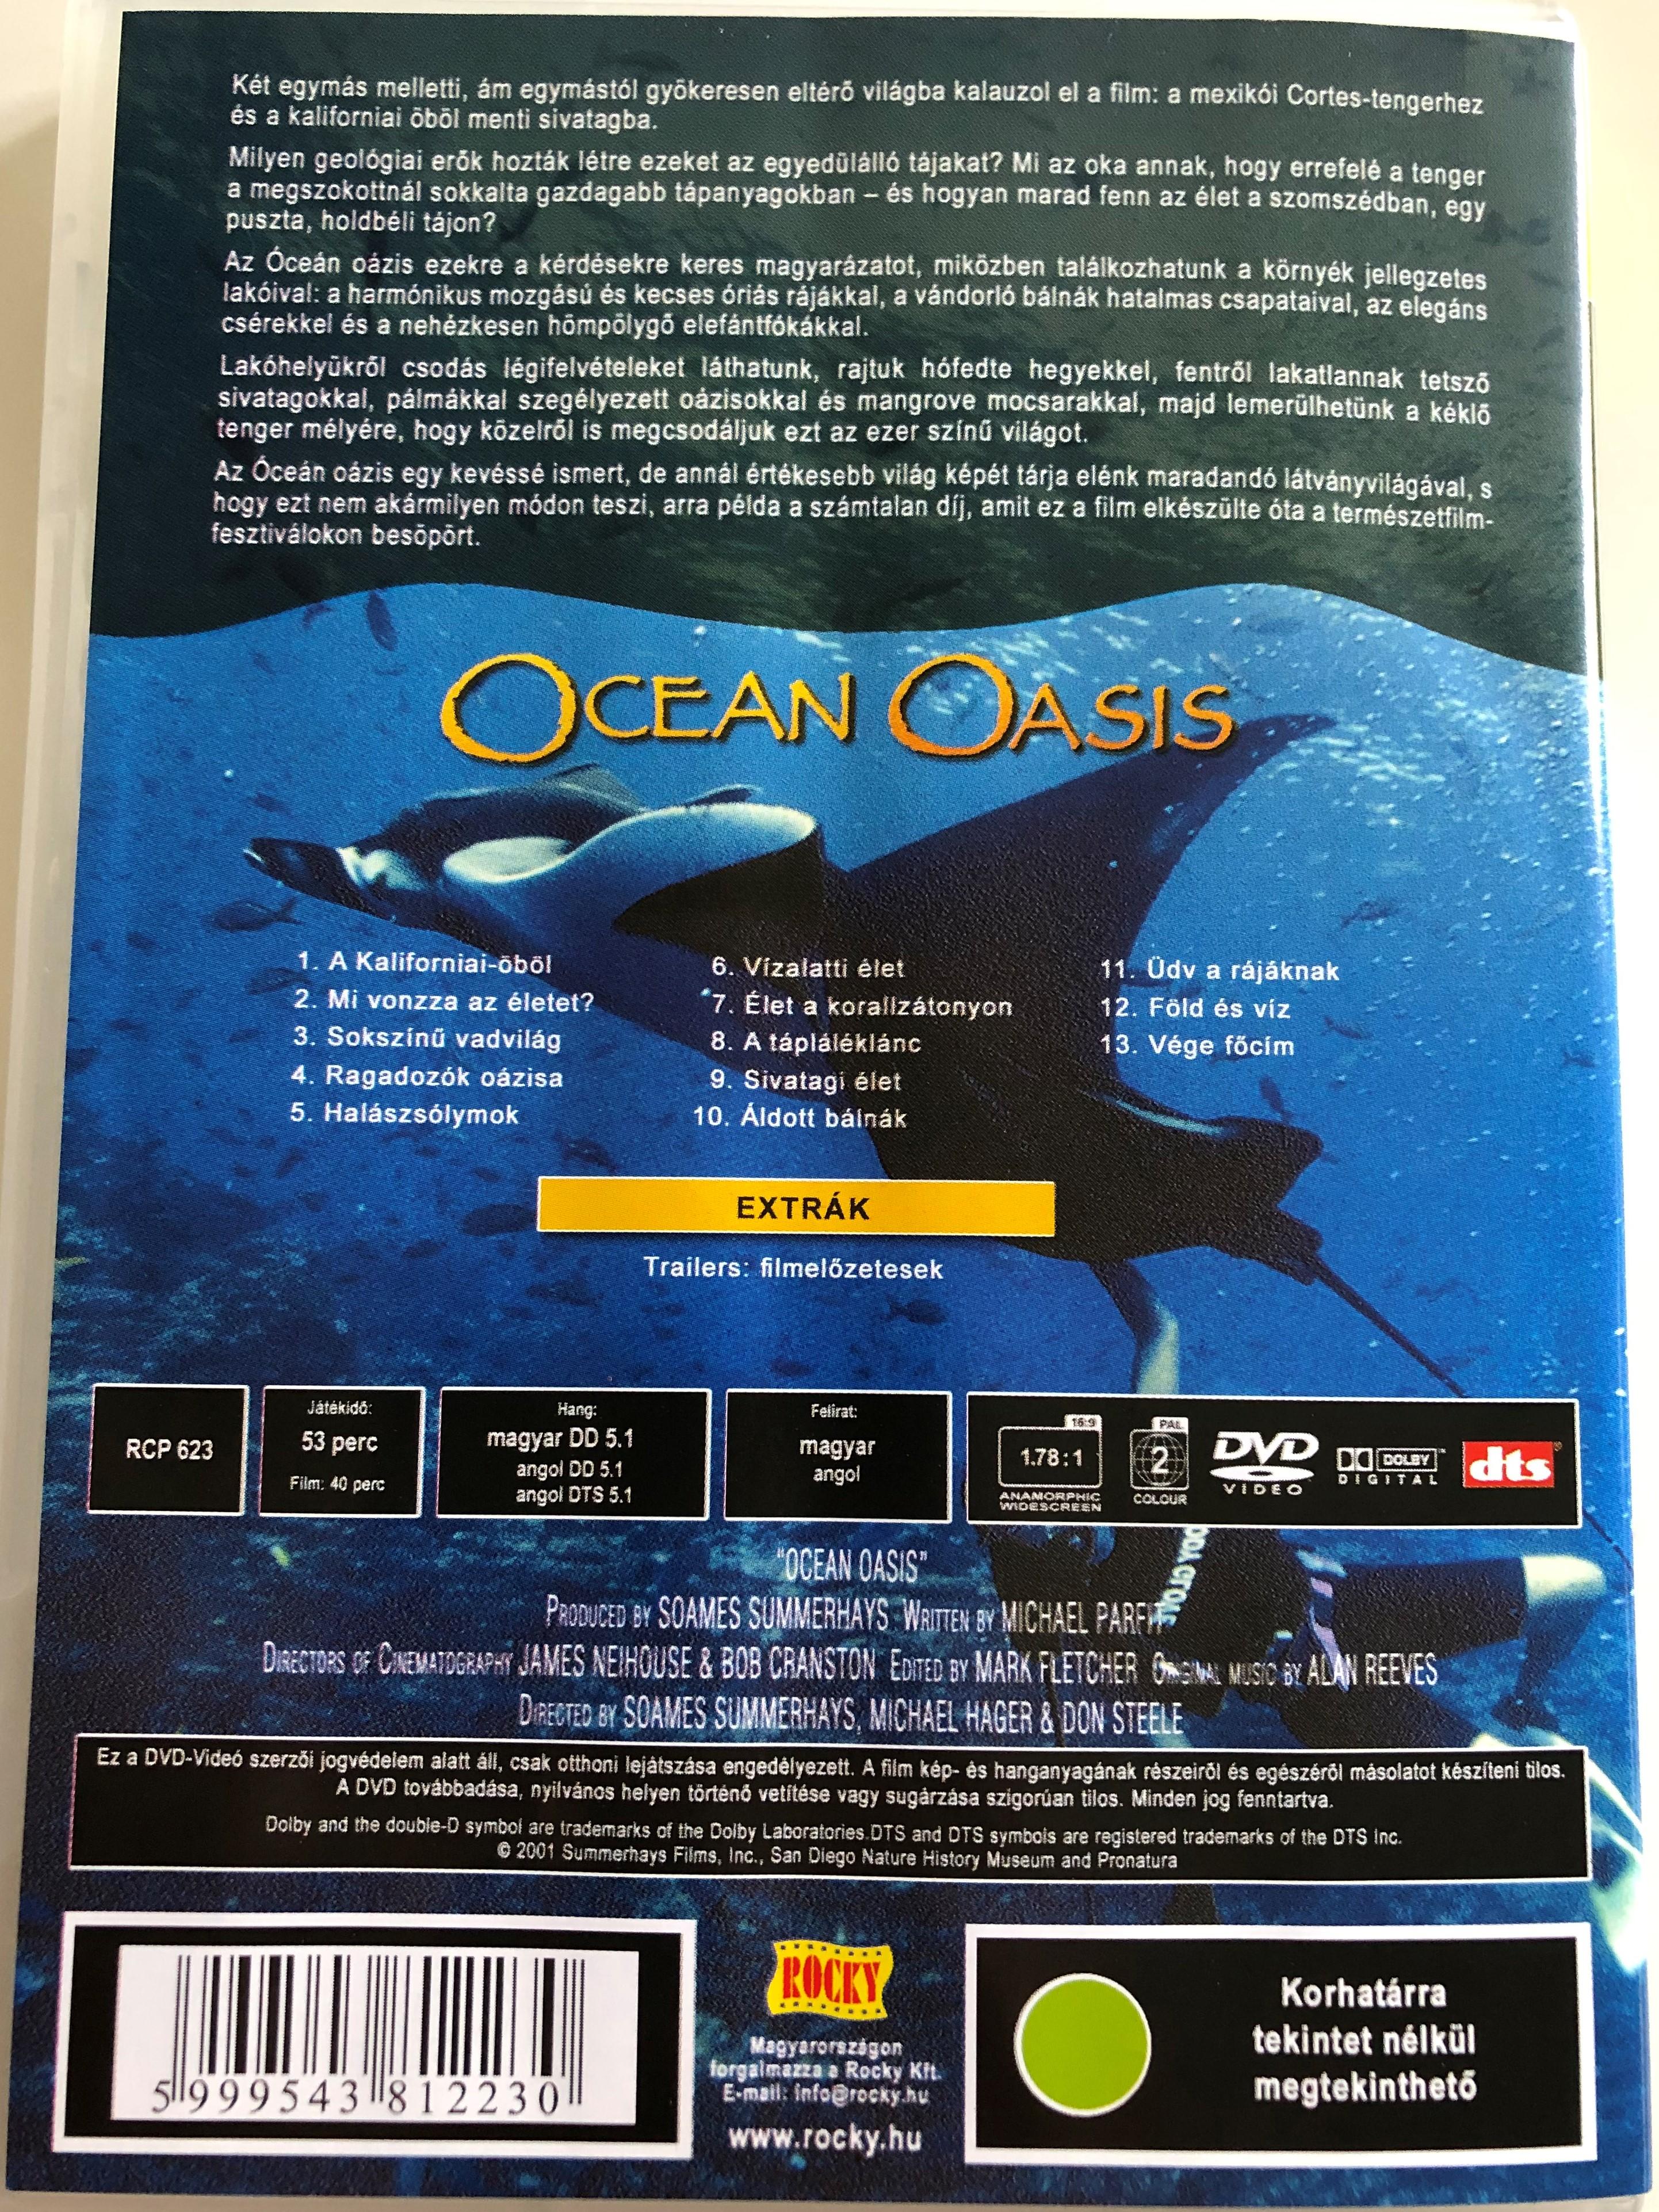 ocean-oasis-dvd-2001-oce-n-o-zis-directed-by-soames-summerhays-michael-hager-don-steele-documentary-about-ocean-wildlife-2-.jpg